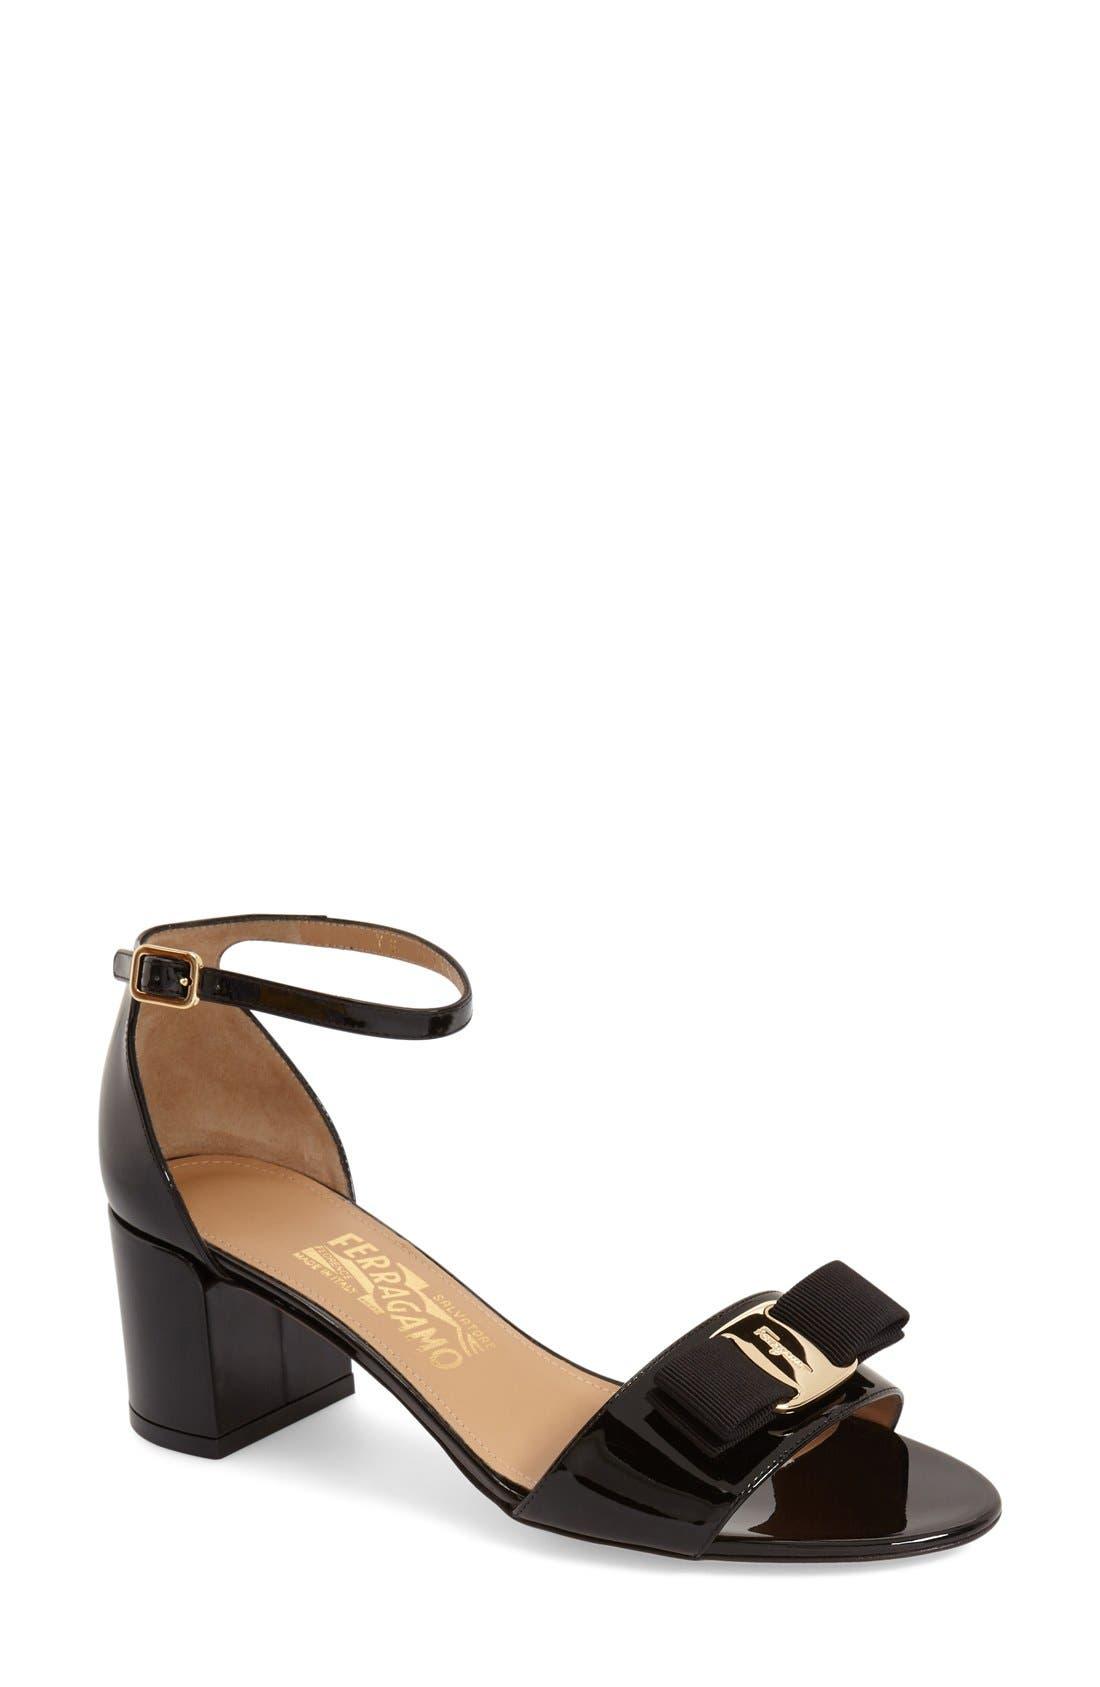 Gavina Block Heel Bow Sandal,                         Main,                         color, Black Patent